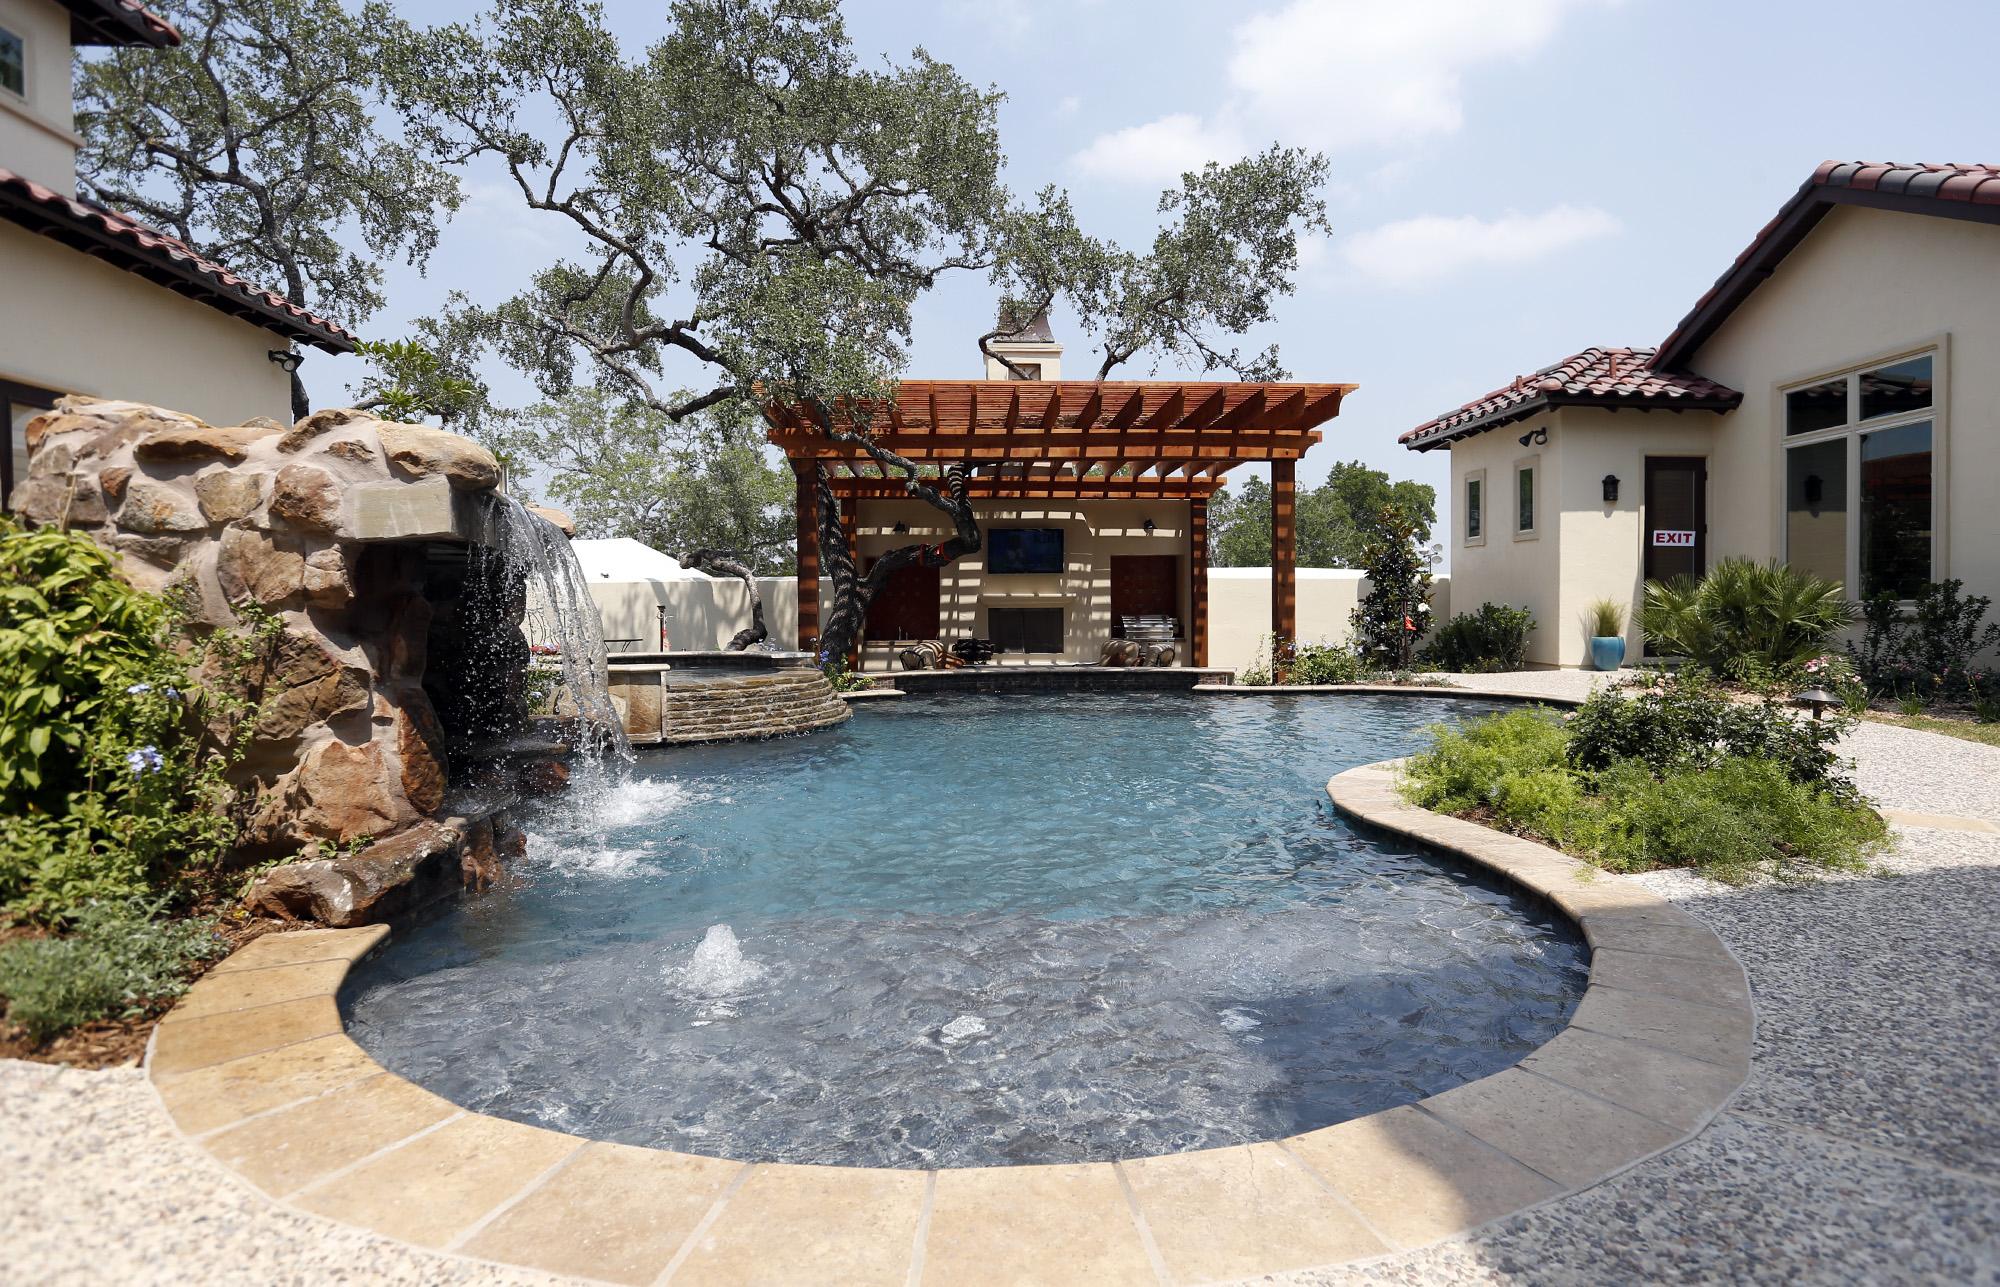 Green homes on parade - San Antonio Express-News